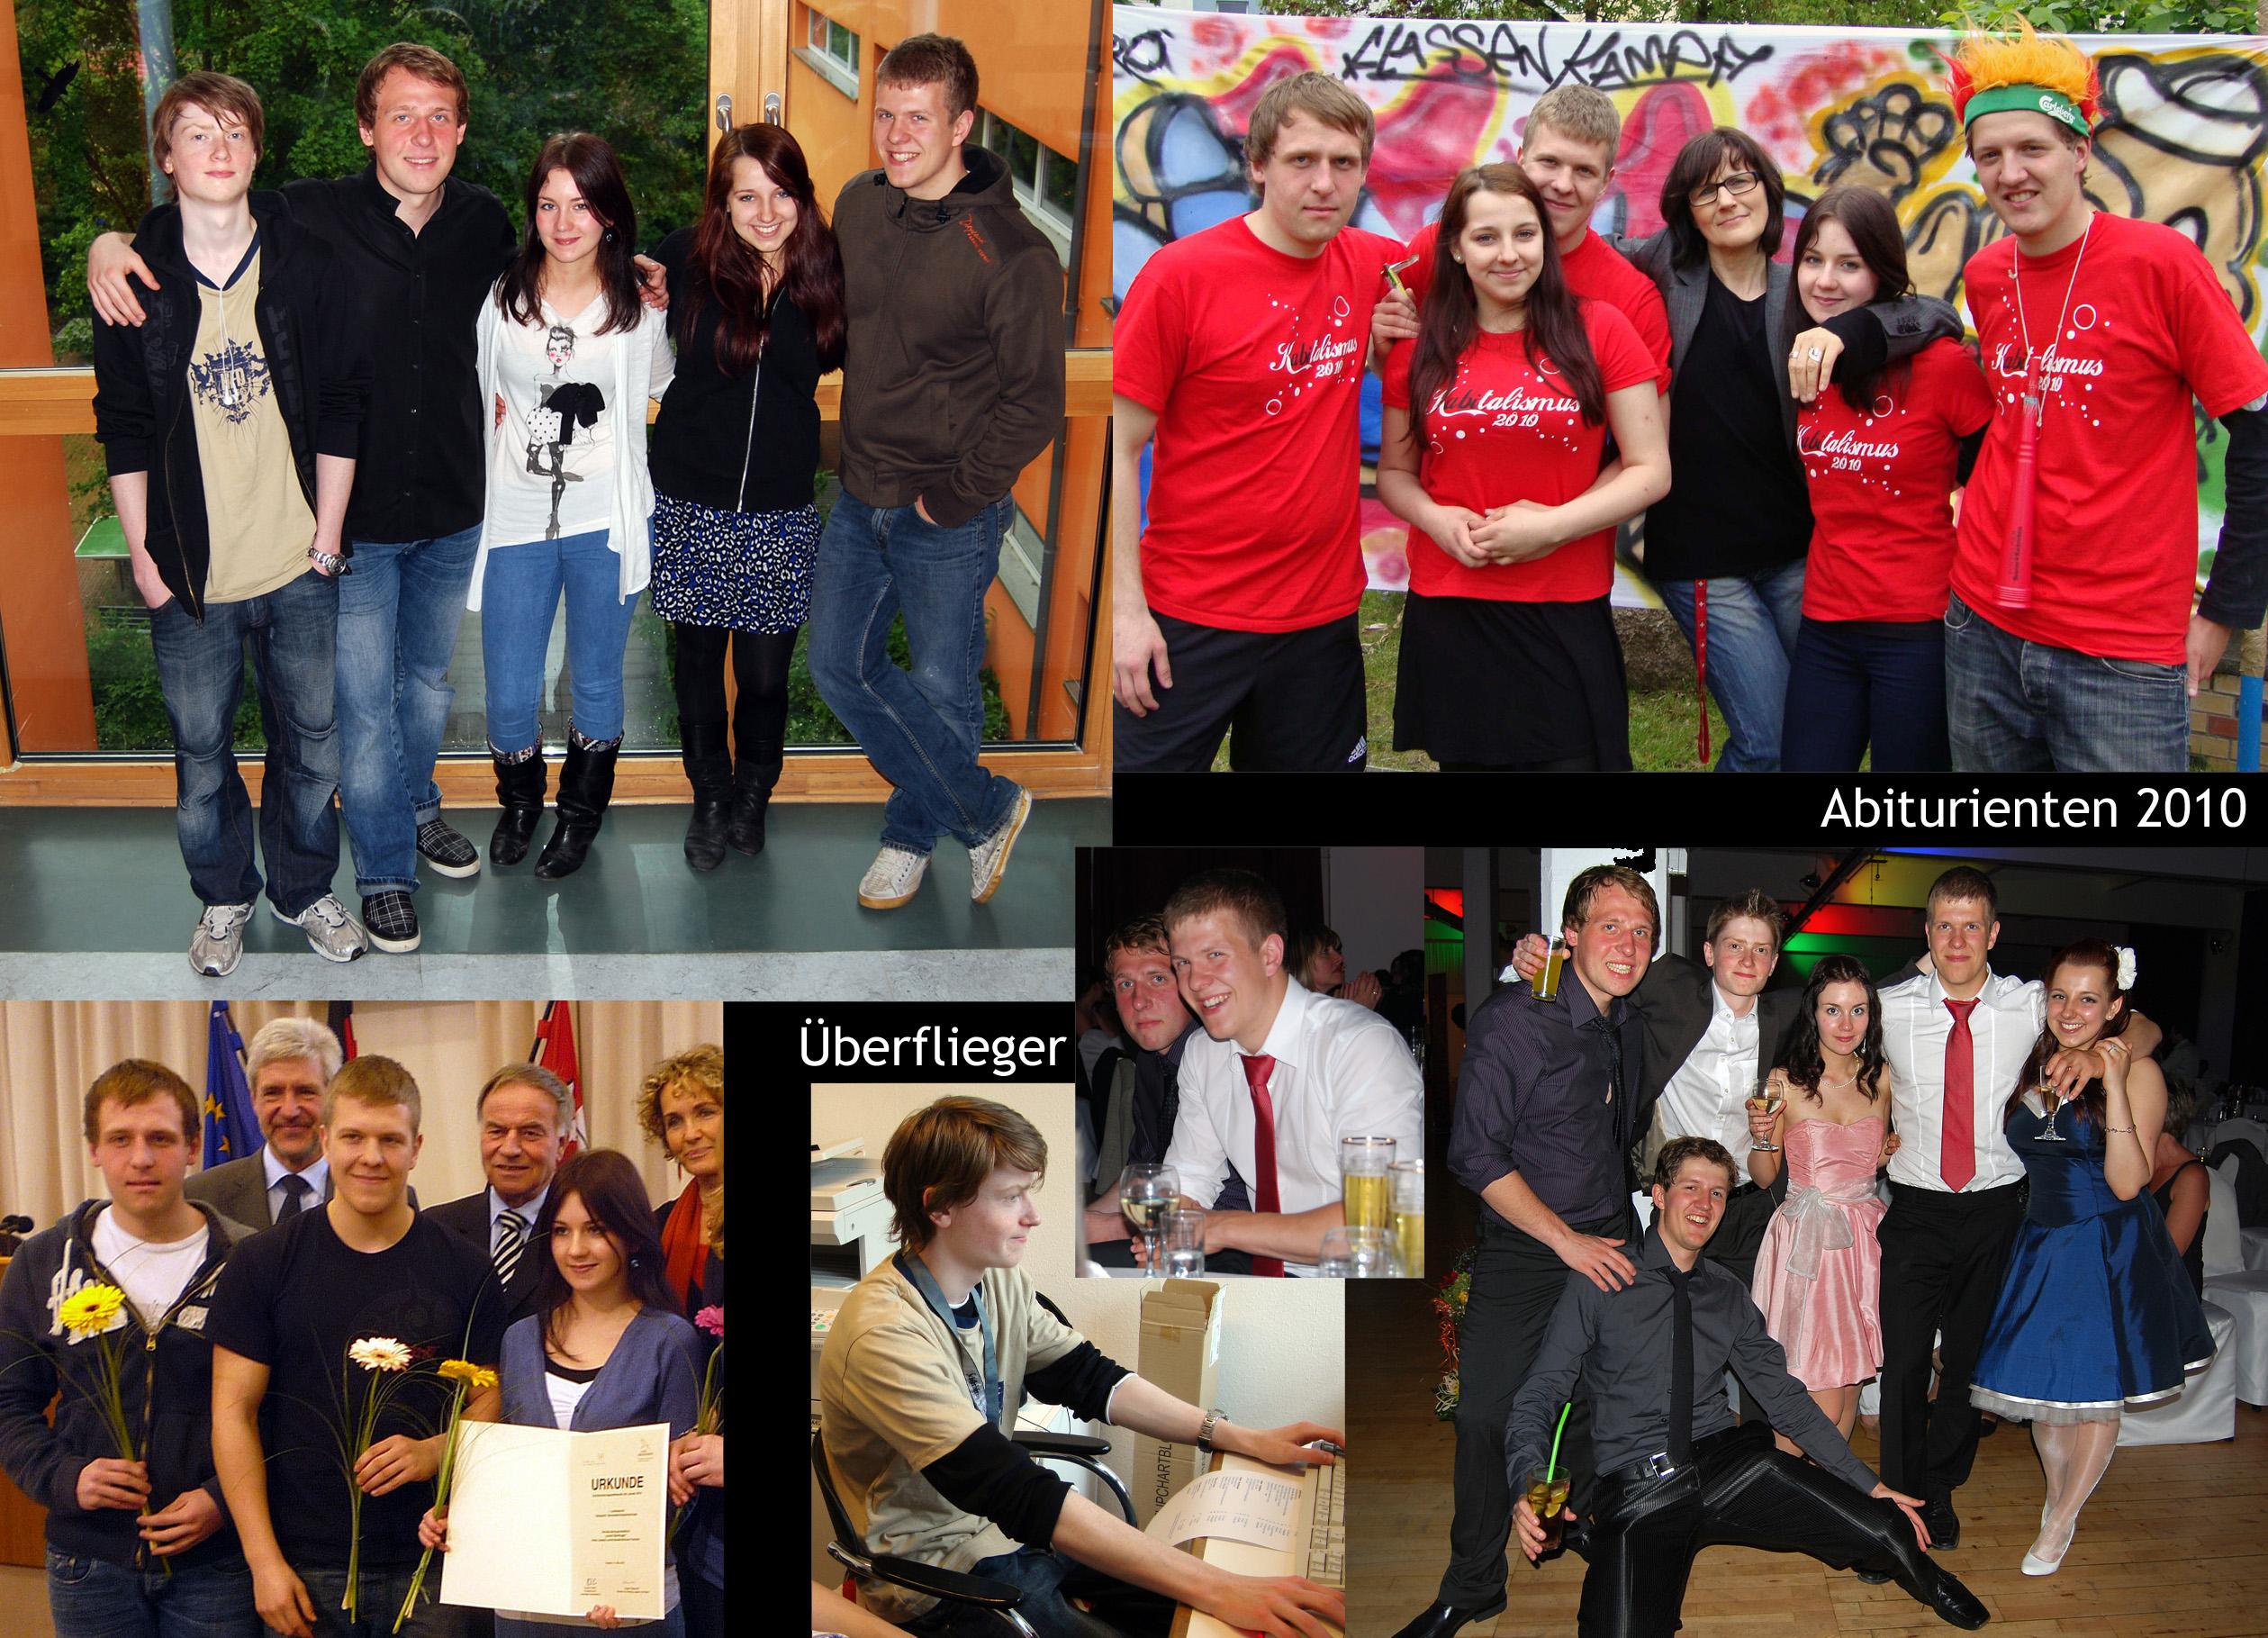 Redakteure. Abitur 2010